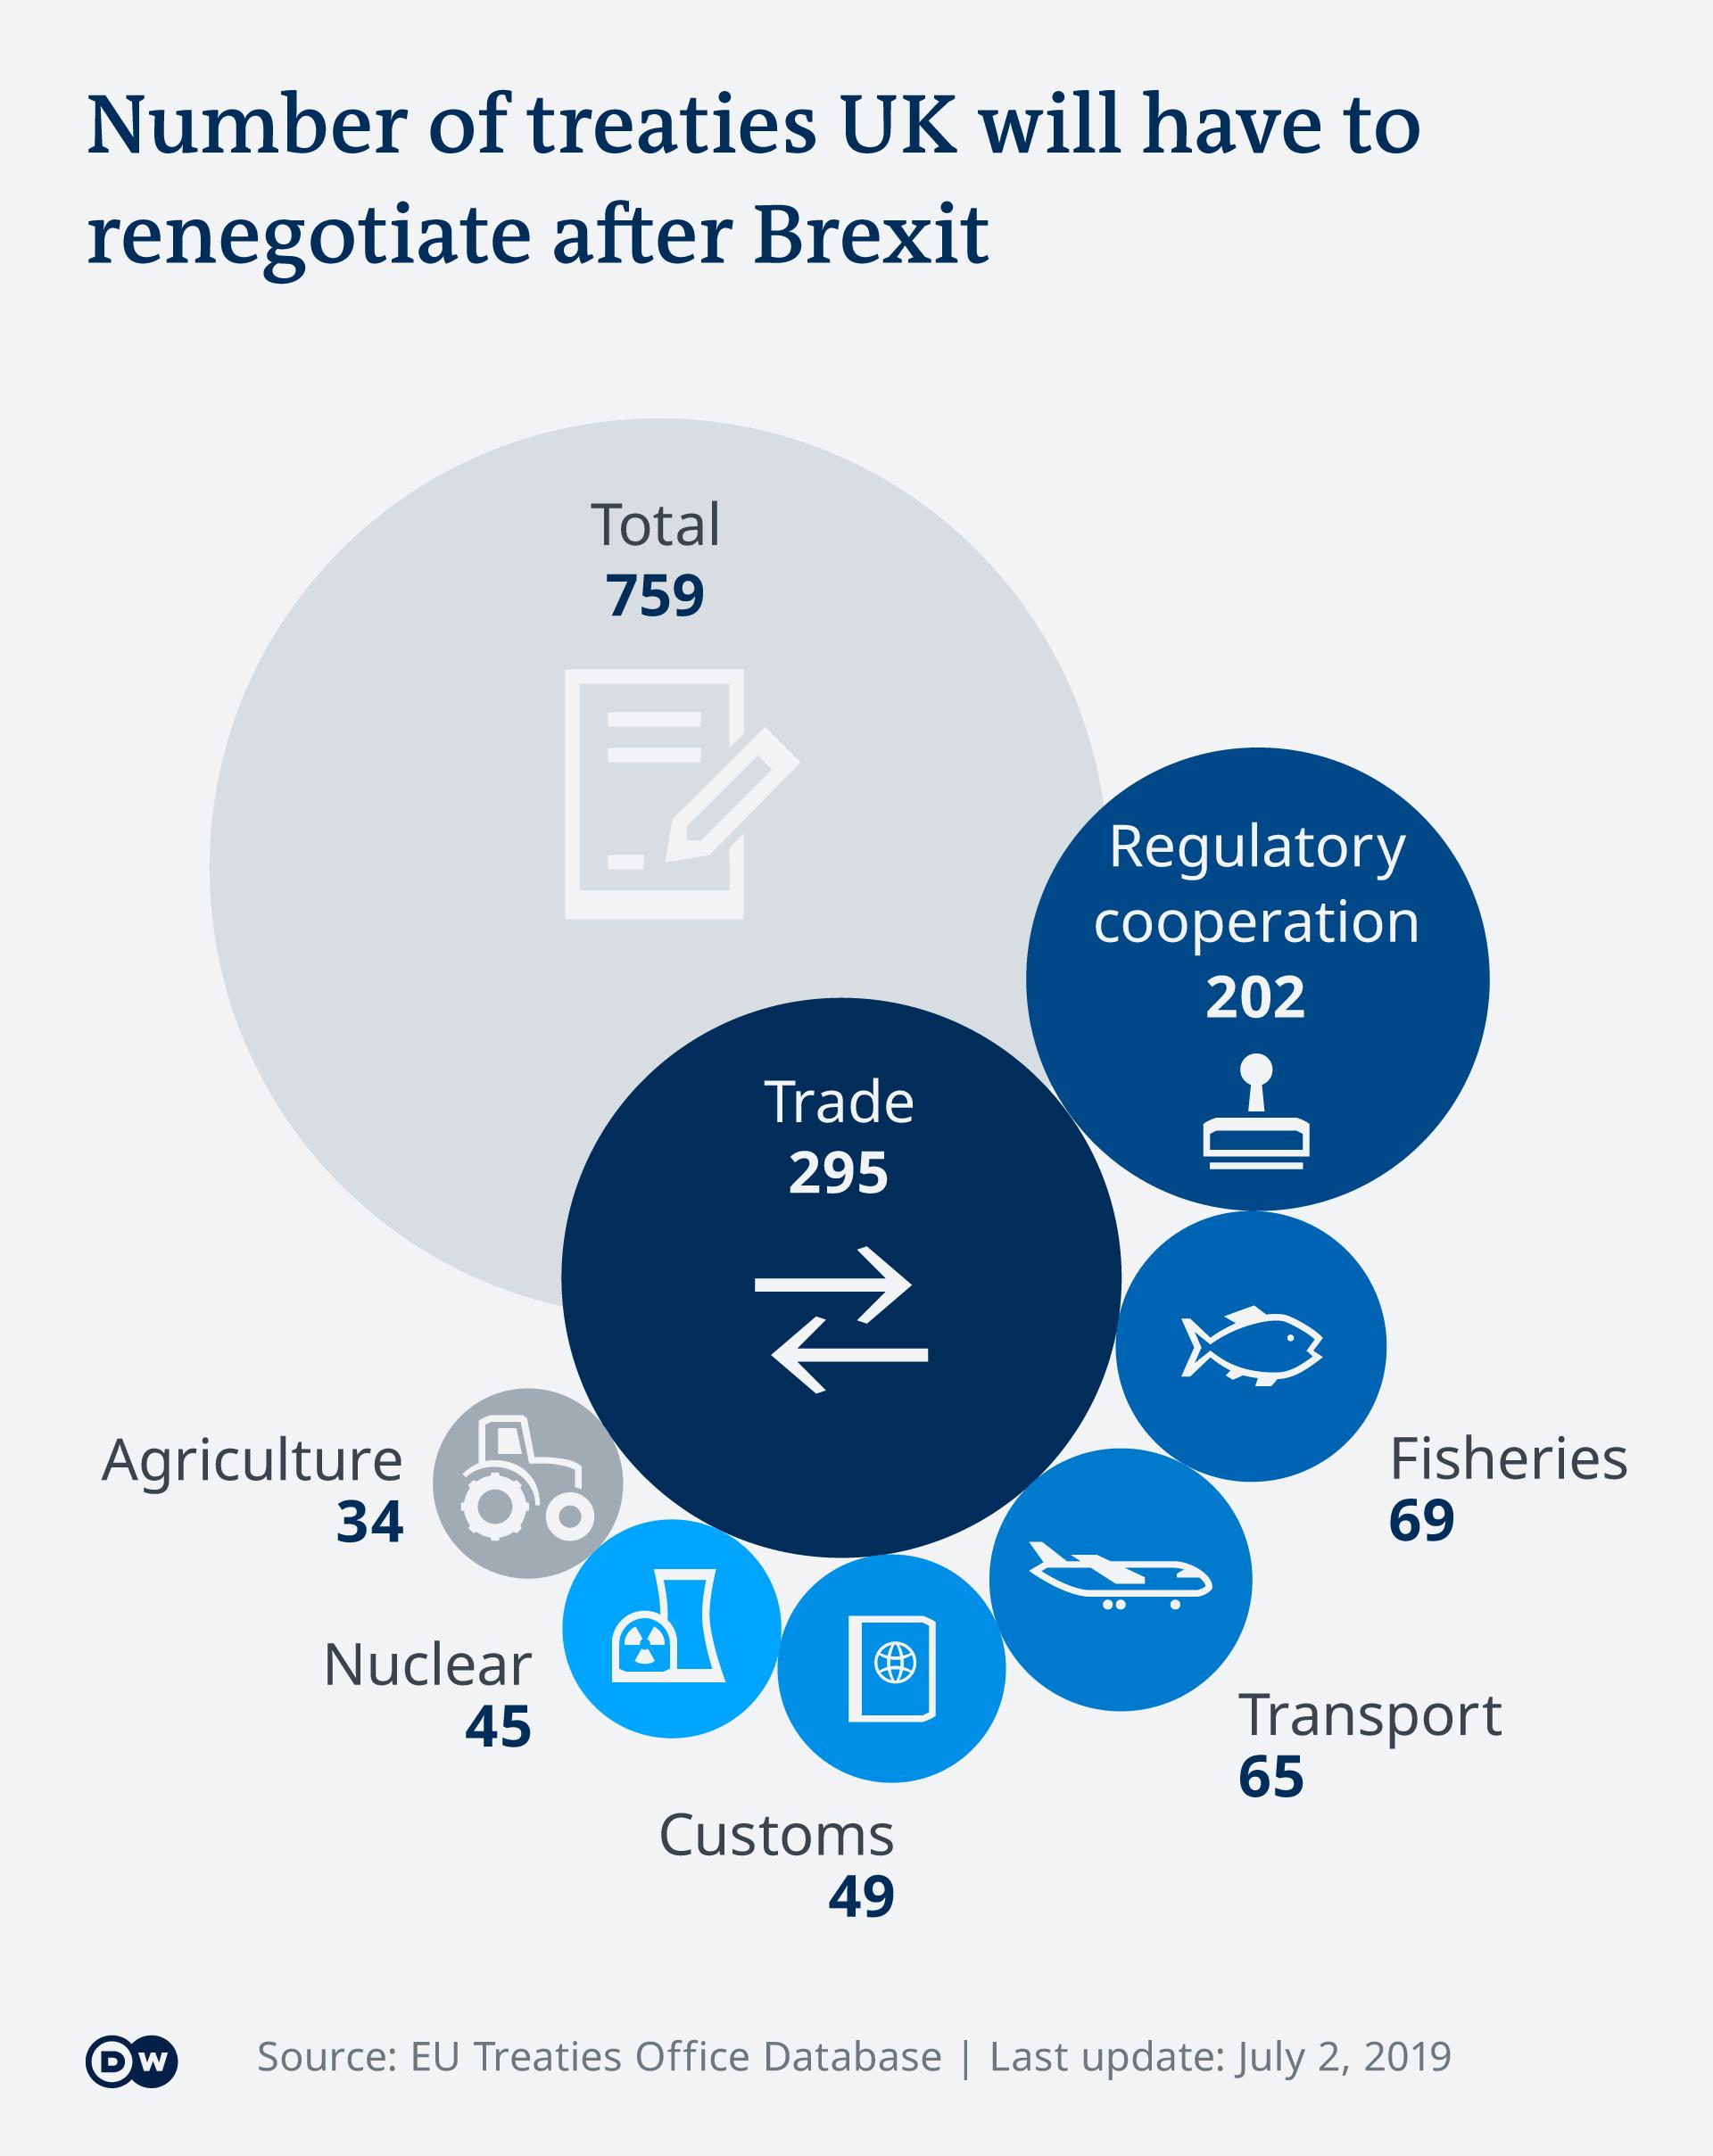 Uni Eropa dan Inggris harus menegosiasikan ulang ratusan perjanjian untuk masa setelah Brexit, termasuk perukanan.